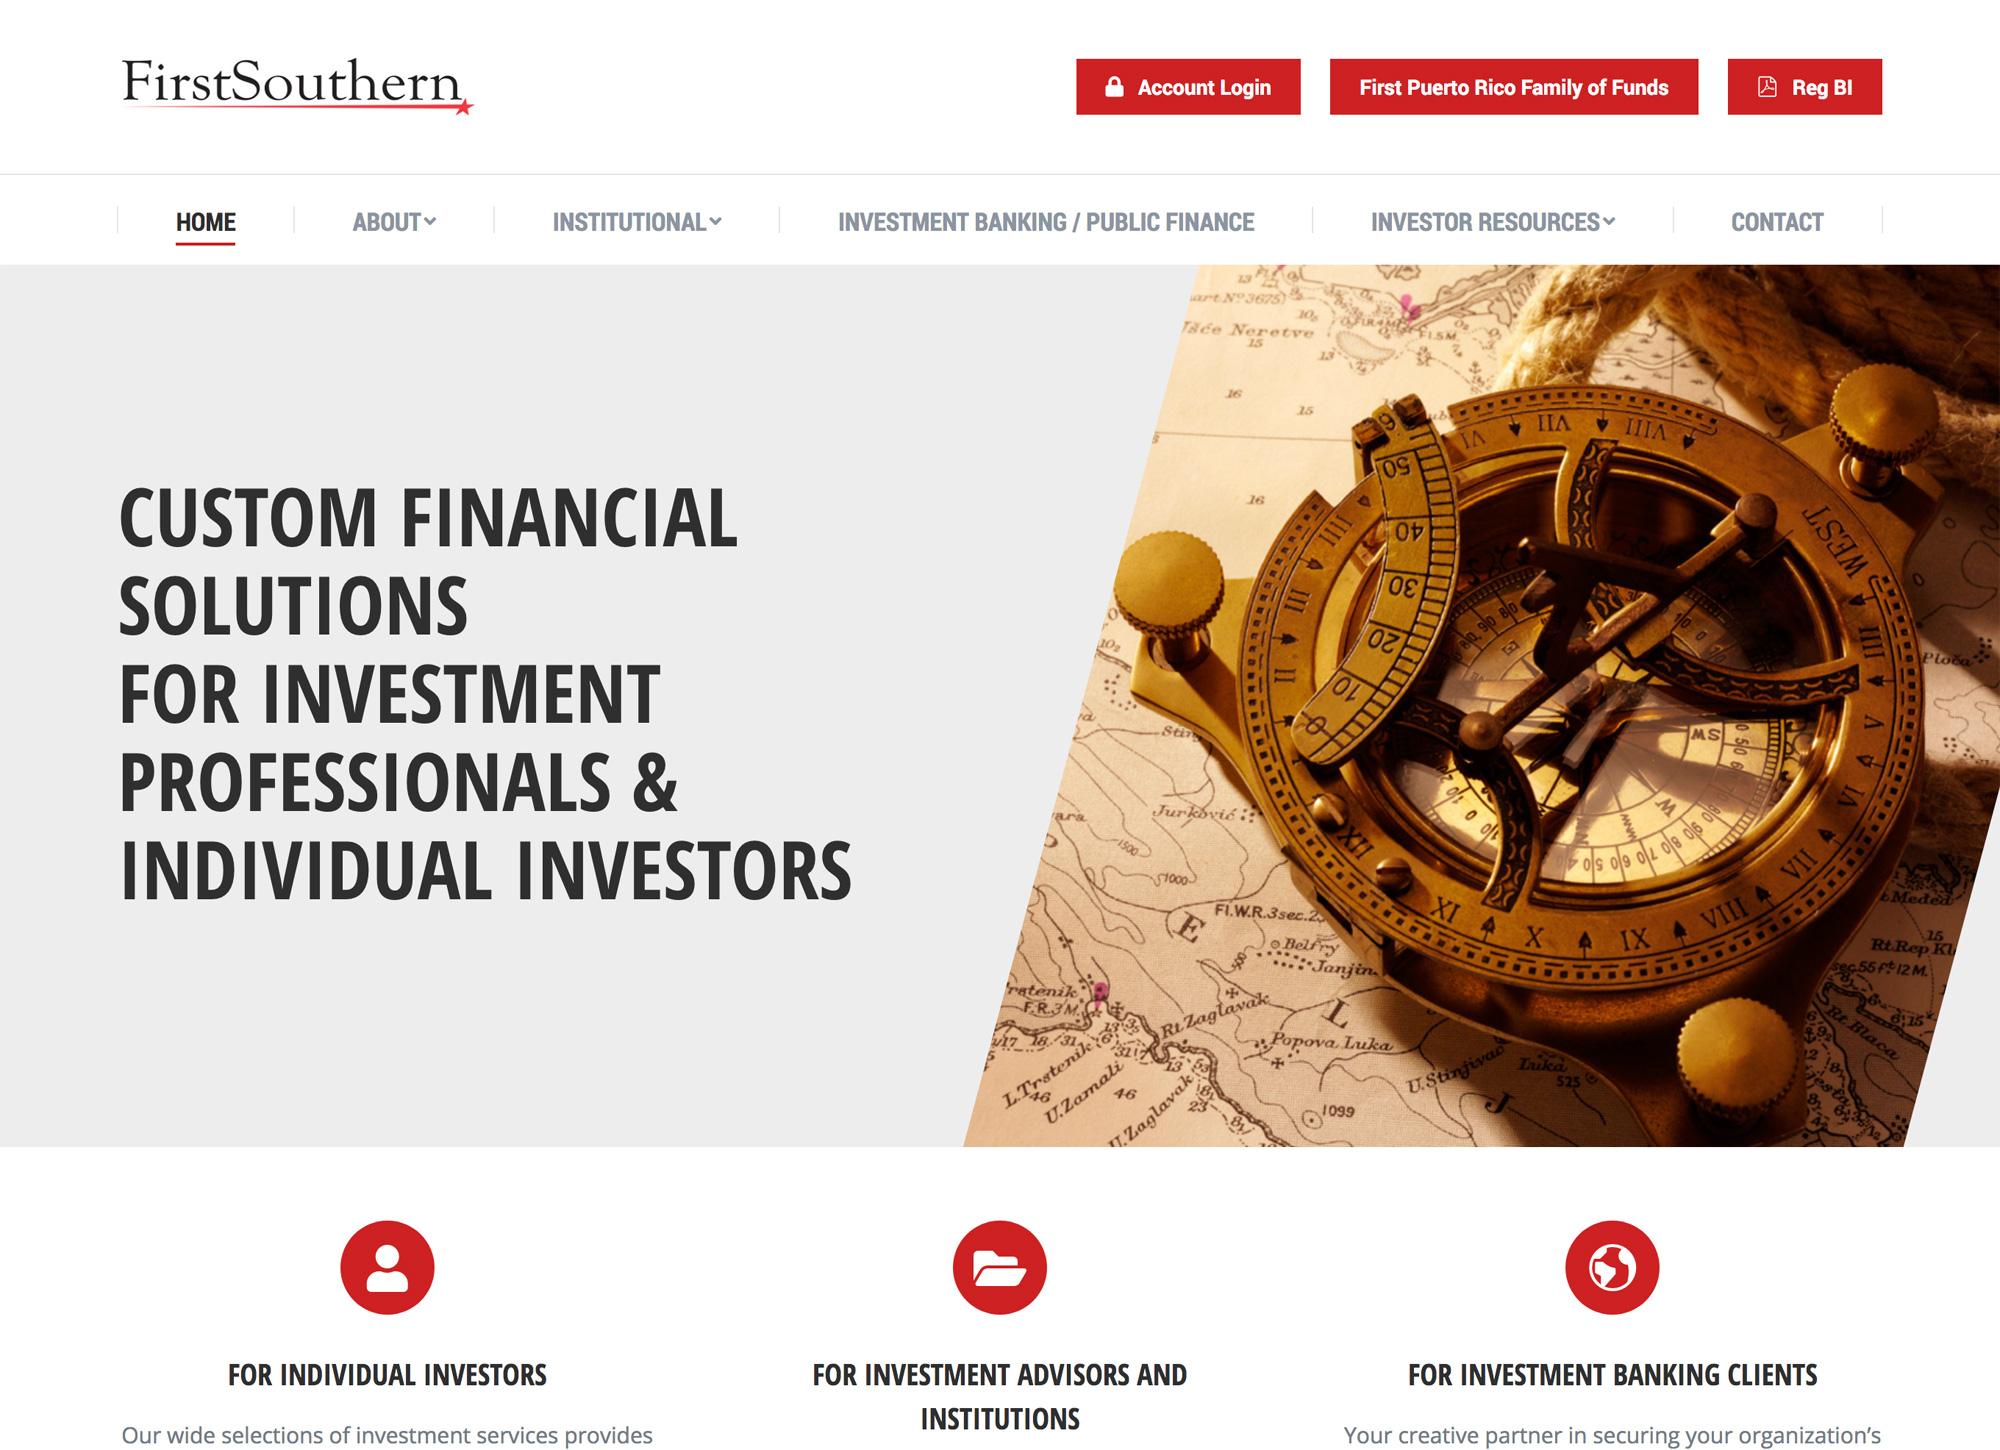 First Southern website design